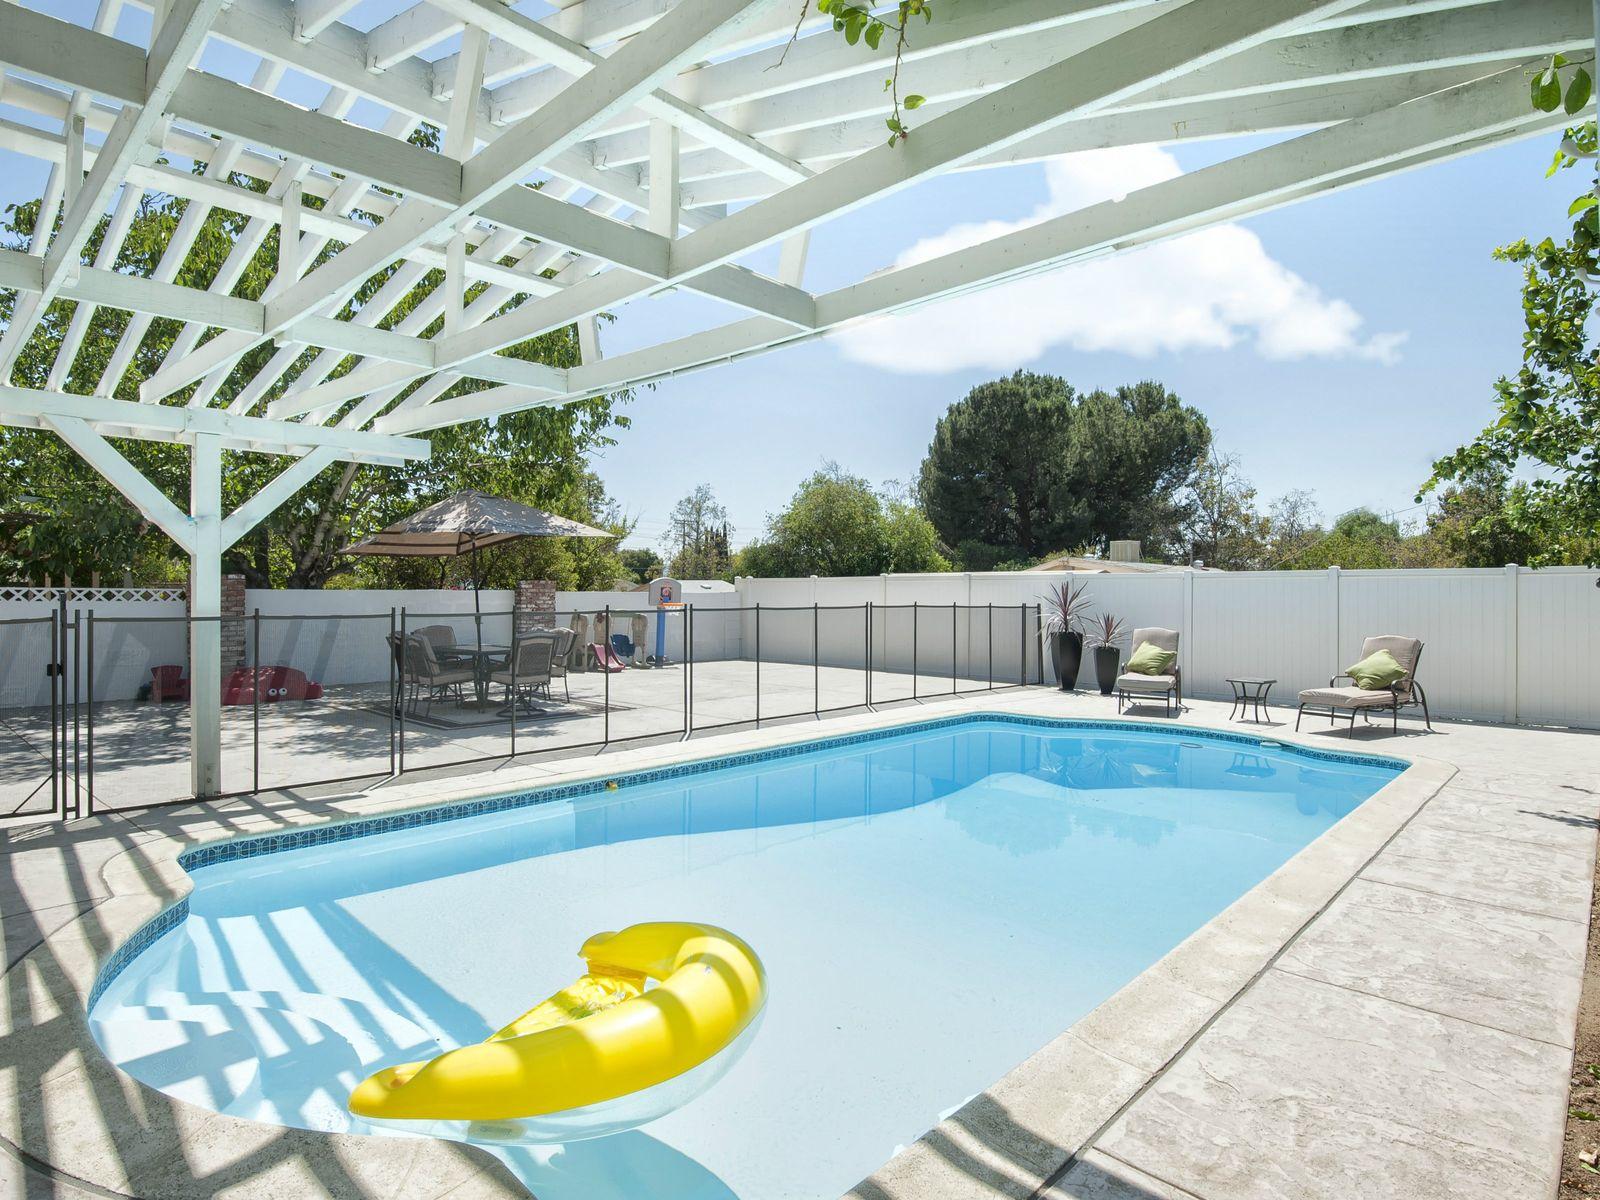 Remodeled Pool Home in Northridge